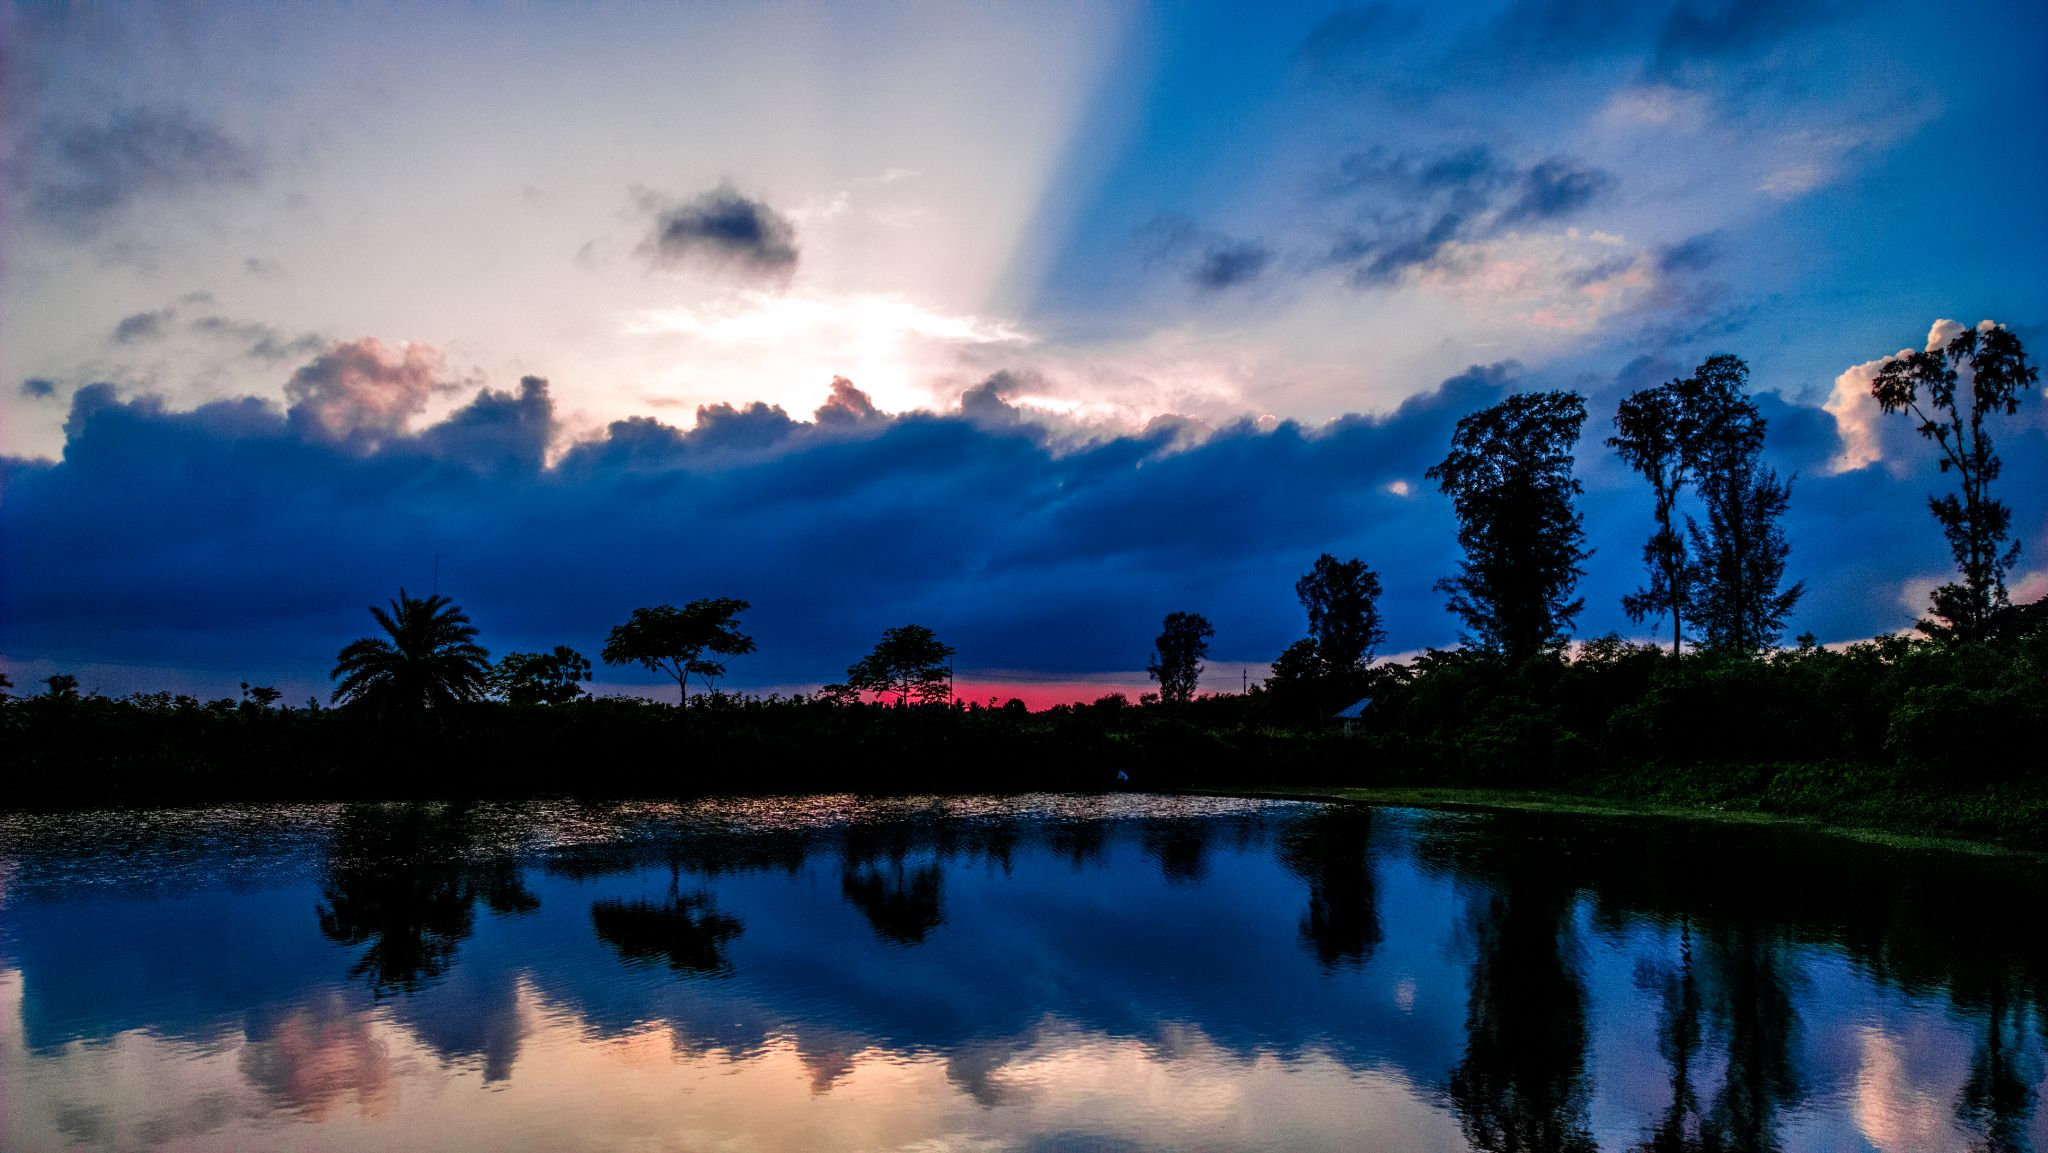 The Last Light by tanvirul.sani